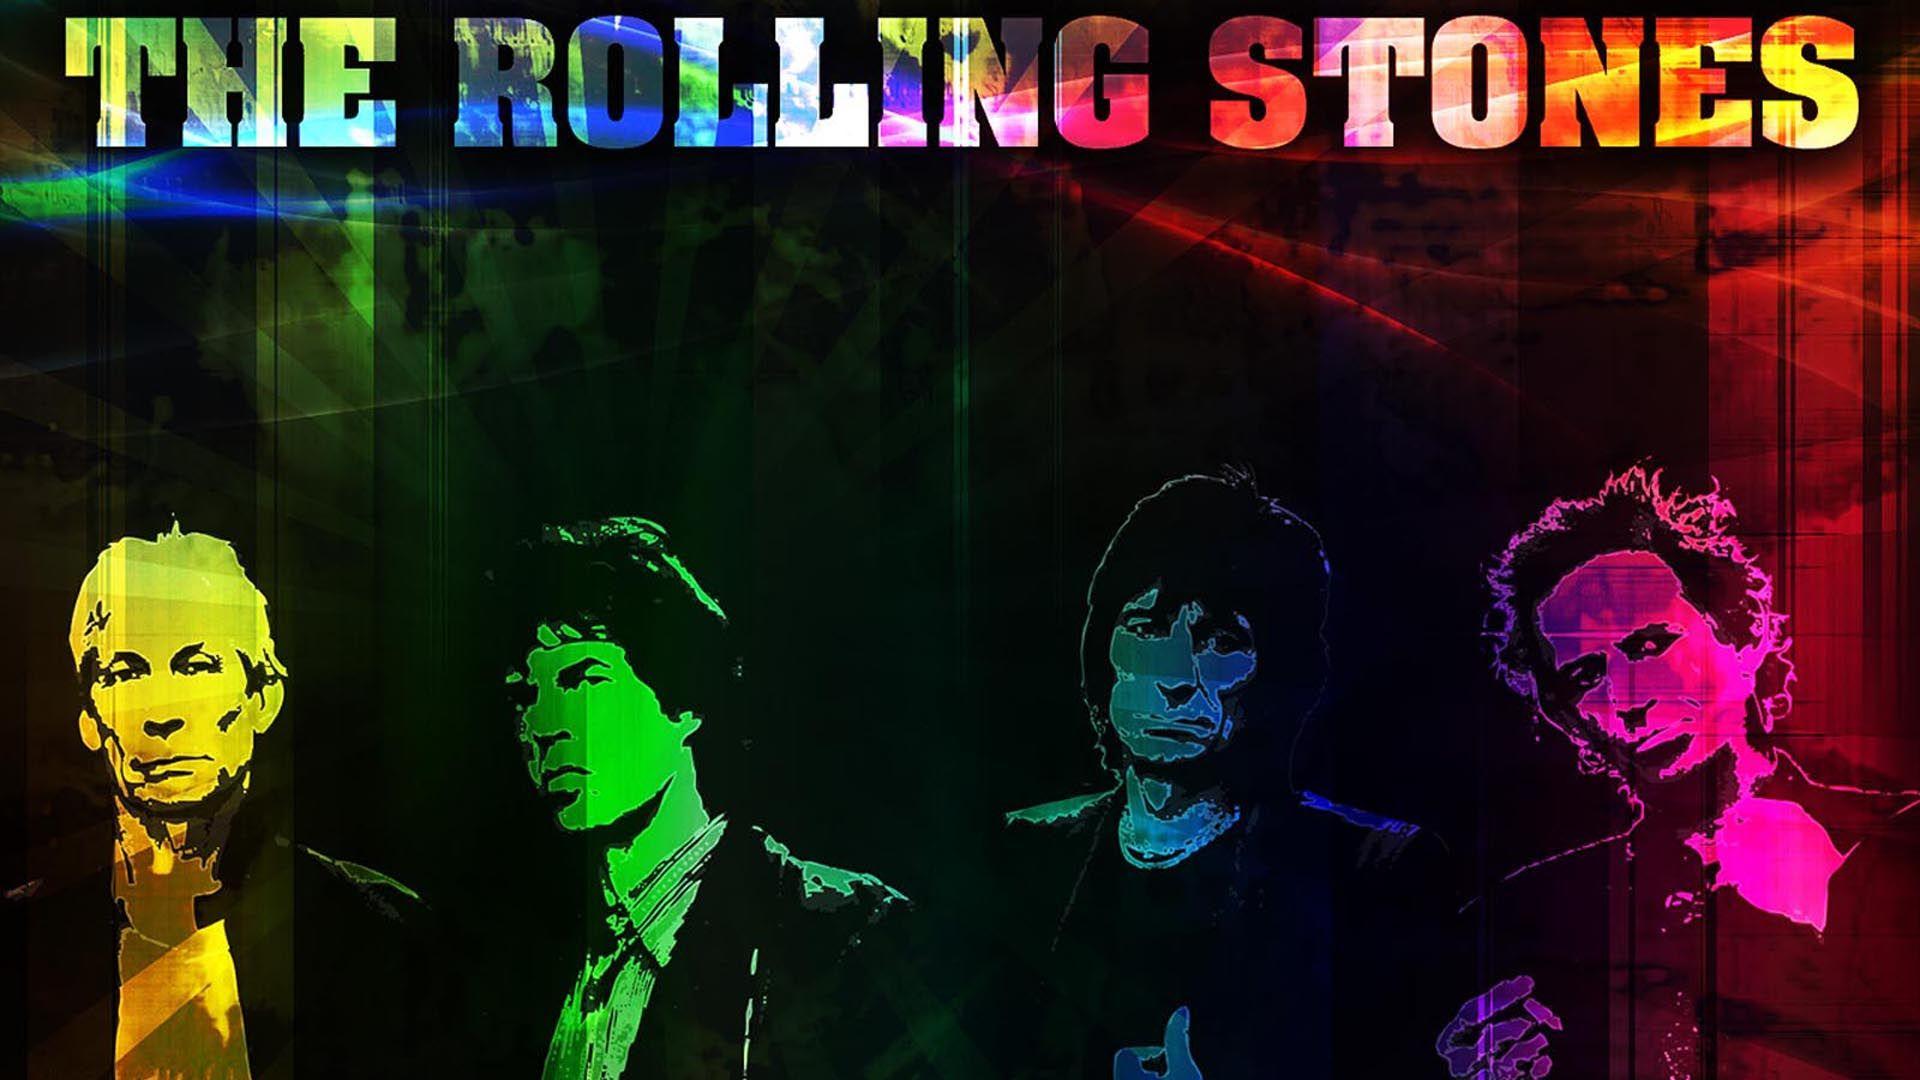 Rolling Stones full hd wallpaper